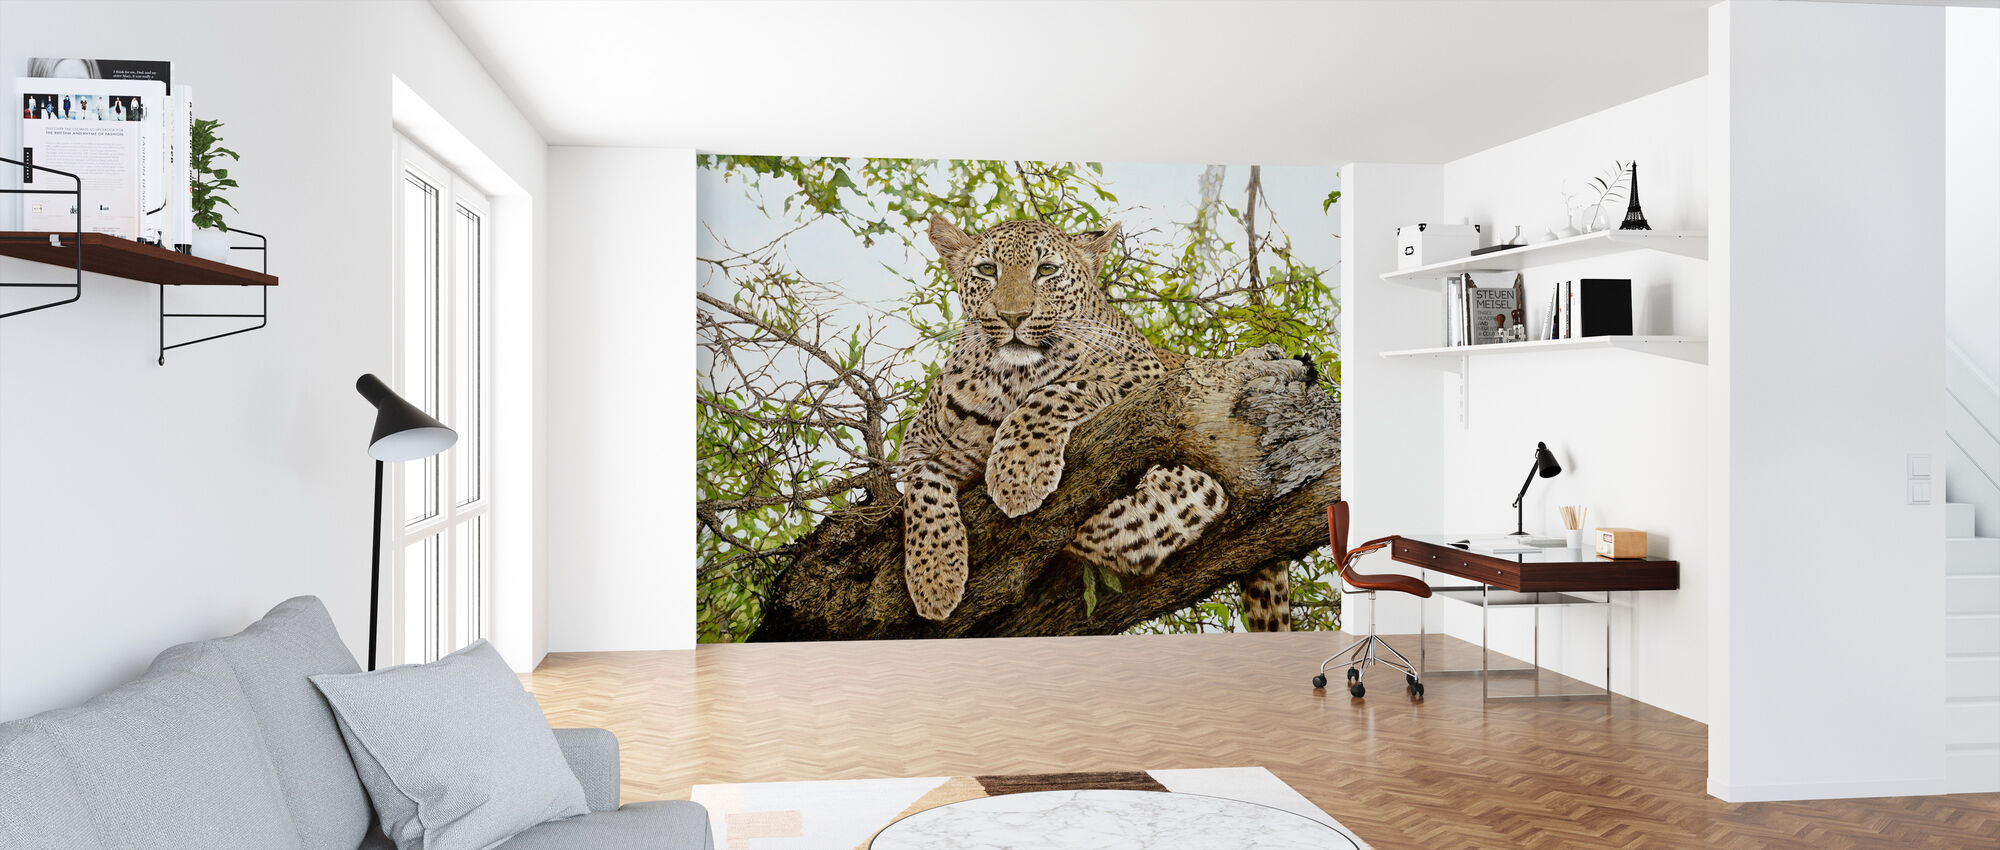 Vorfreude Leopard - Tapete - Büro